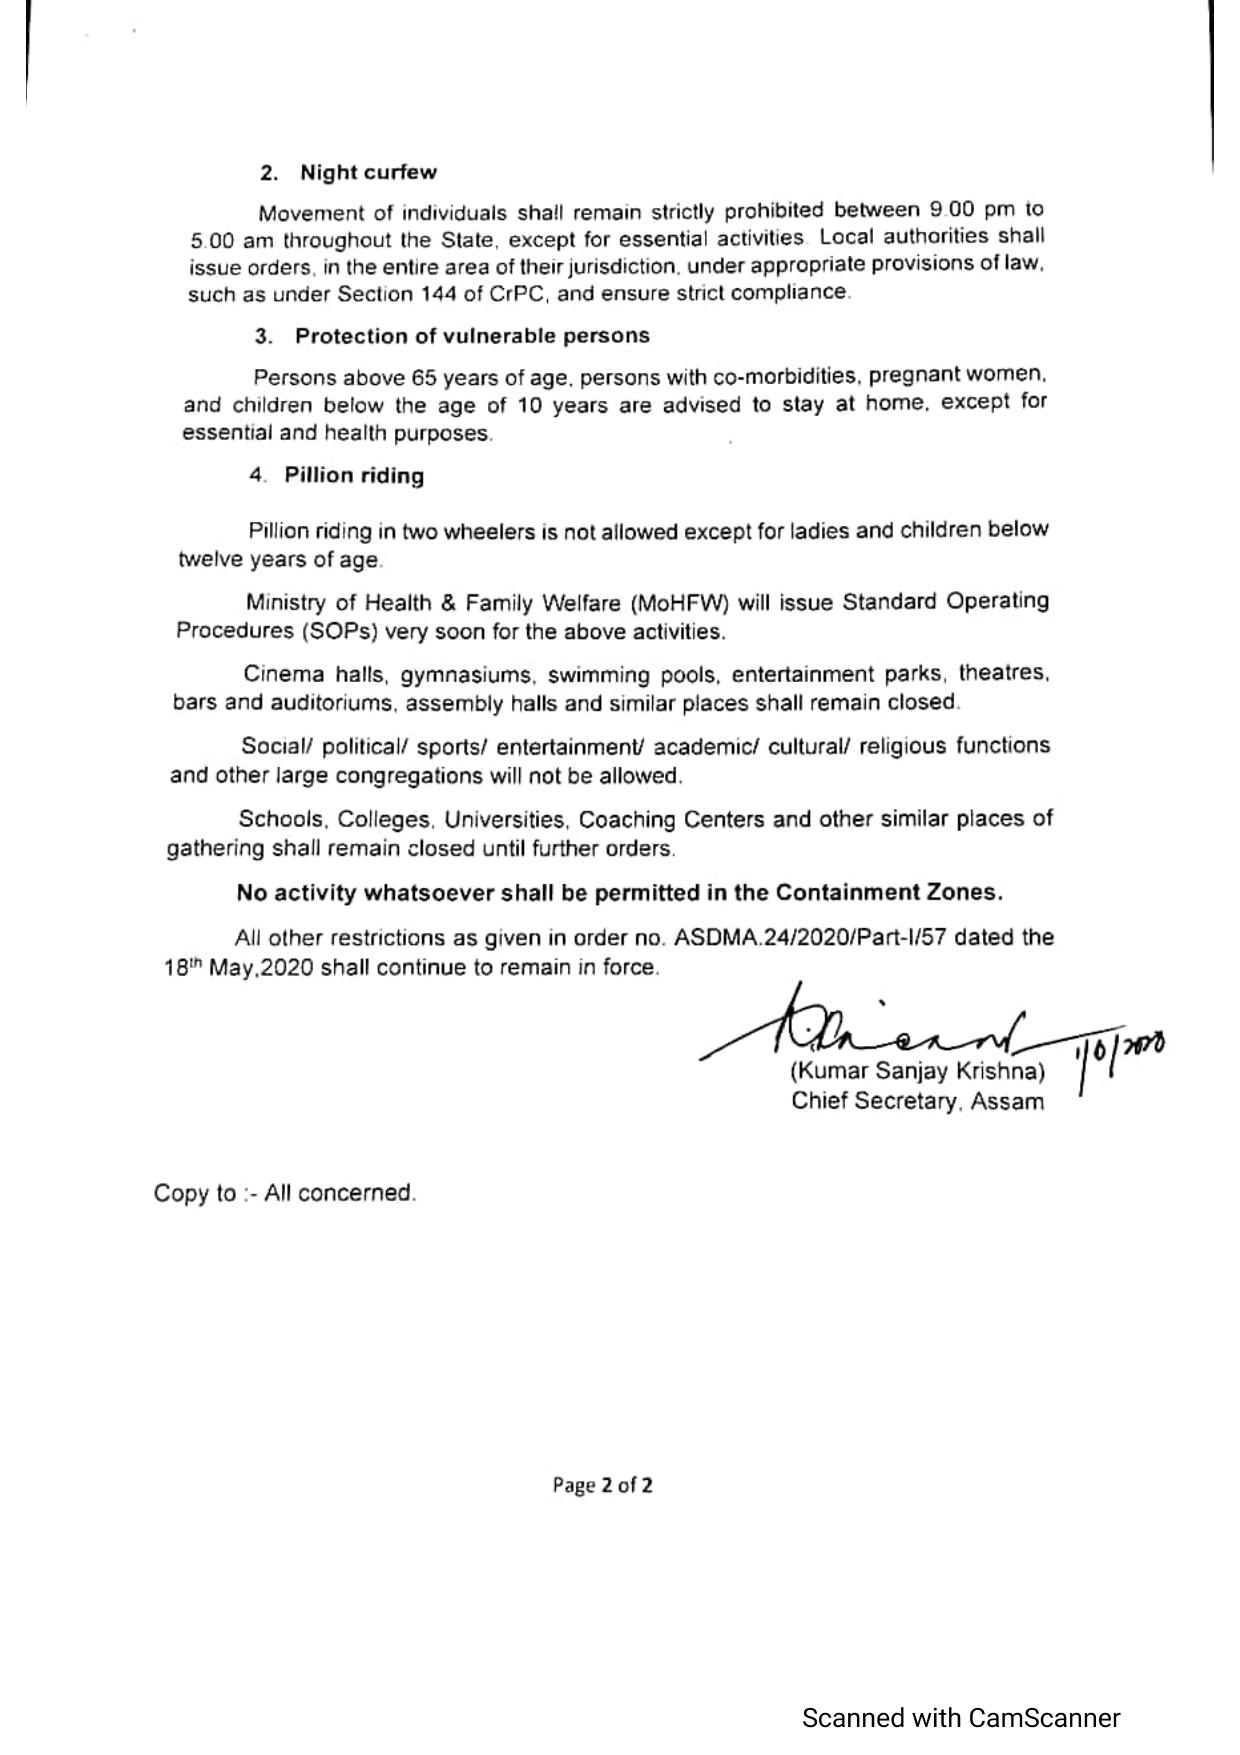 Assam guidelines for Unlock 1 reviwed by Kumar Sanjay Krishna